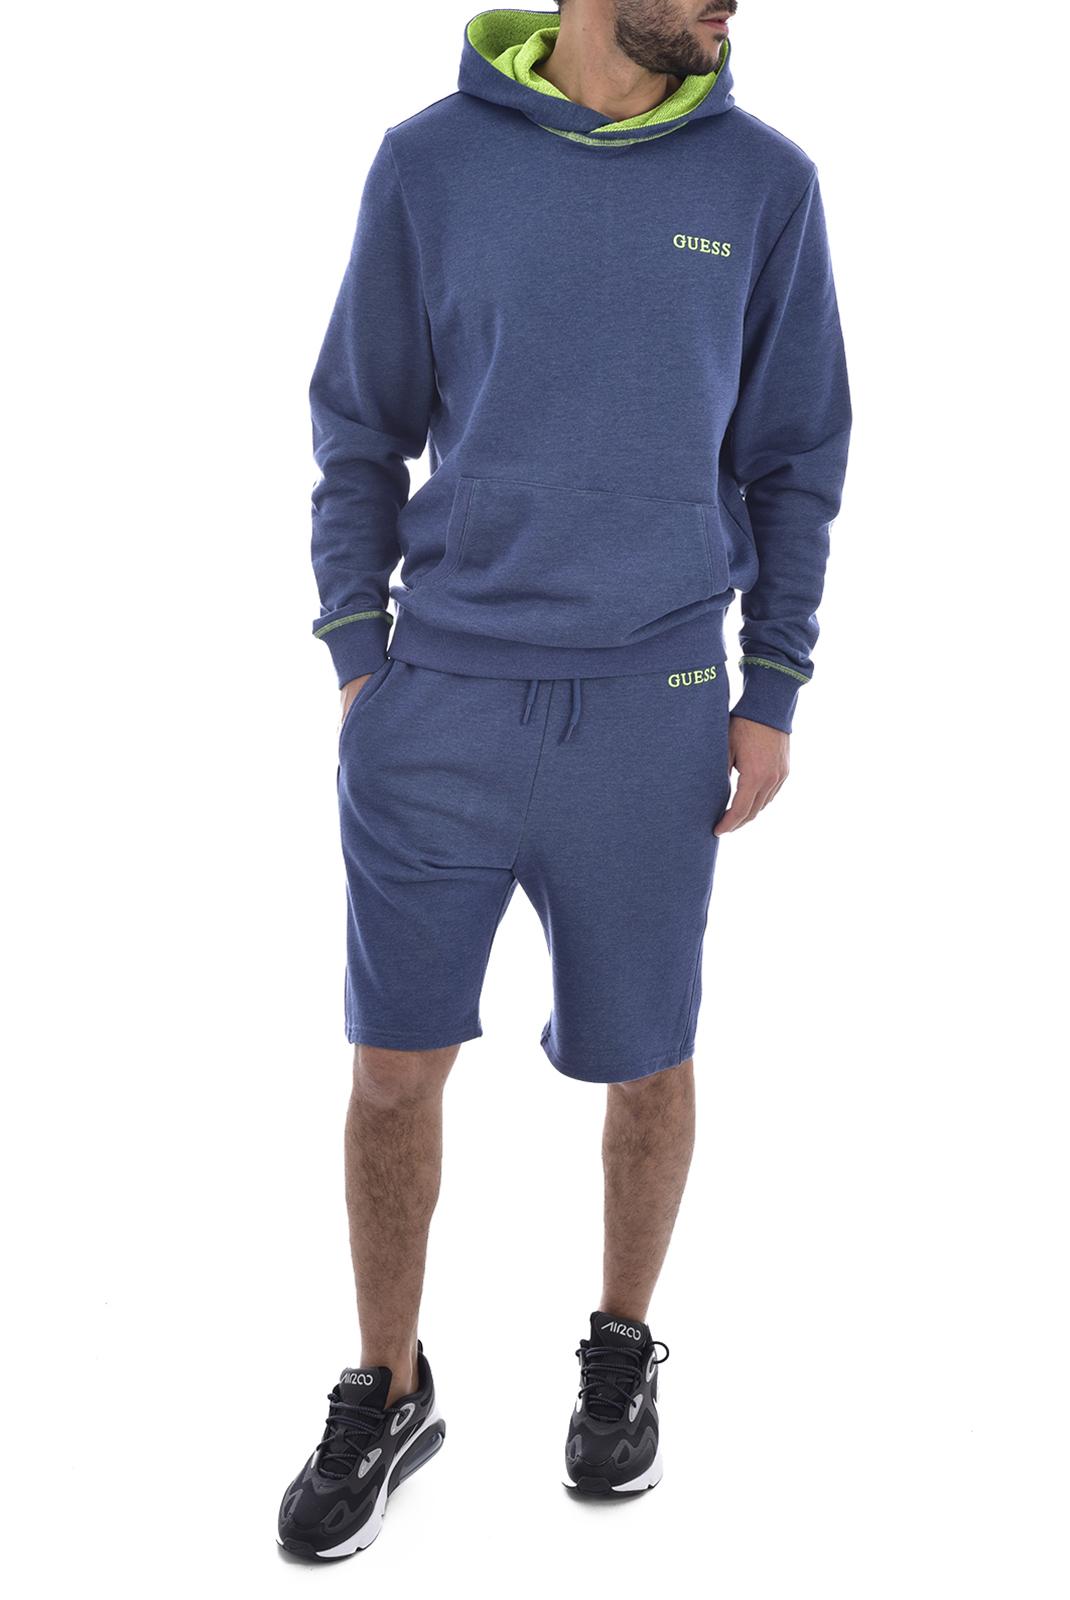 Sweatshirts  Guess jeans M0GQ44 K9PF0 BRADFORD F71B BLUE AND NEON YELLOW